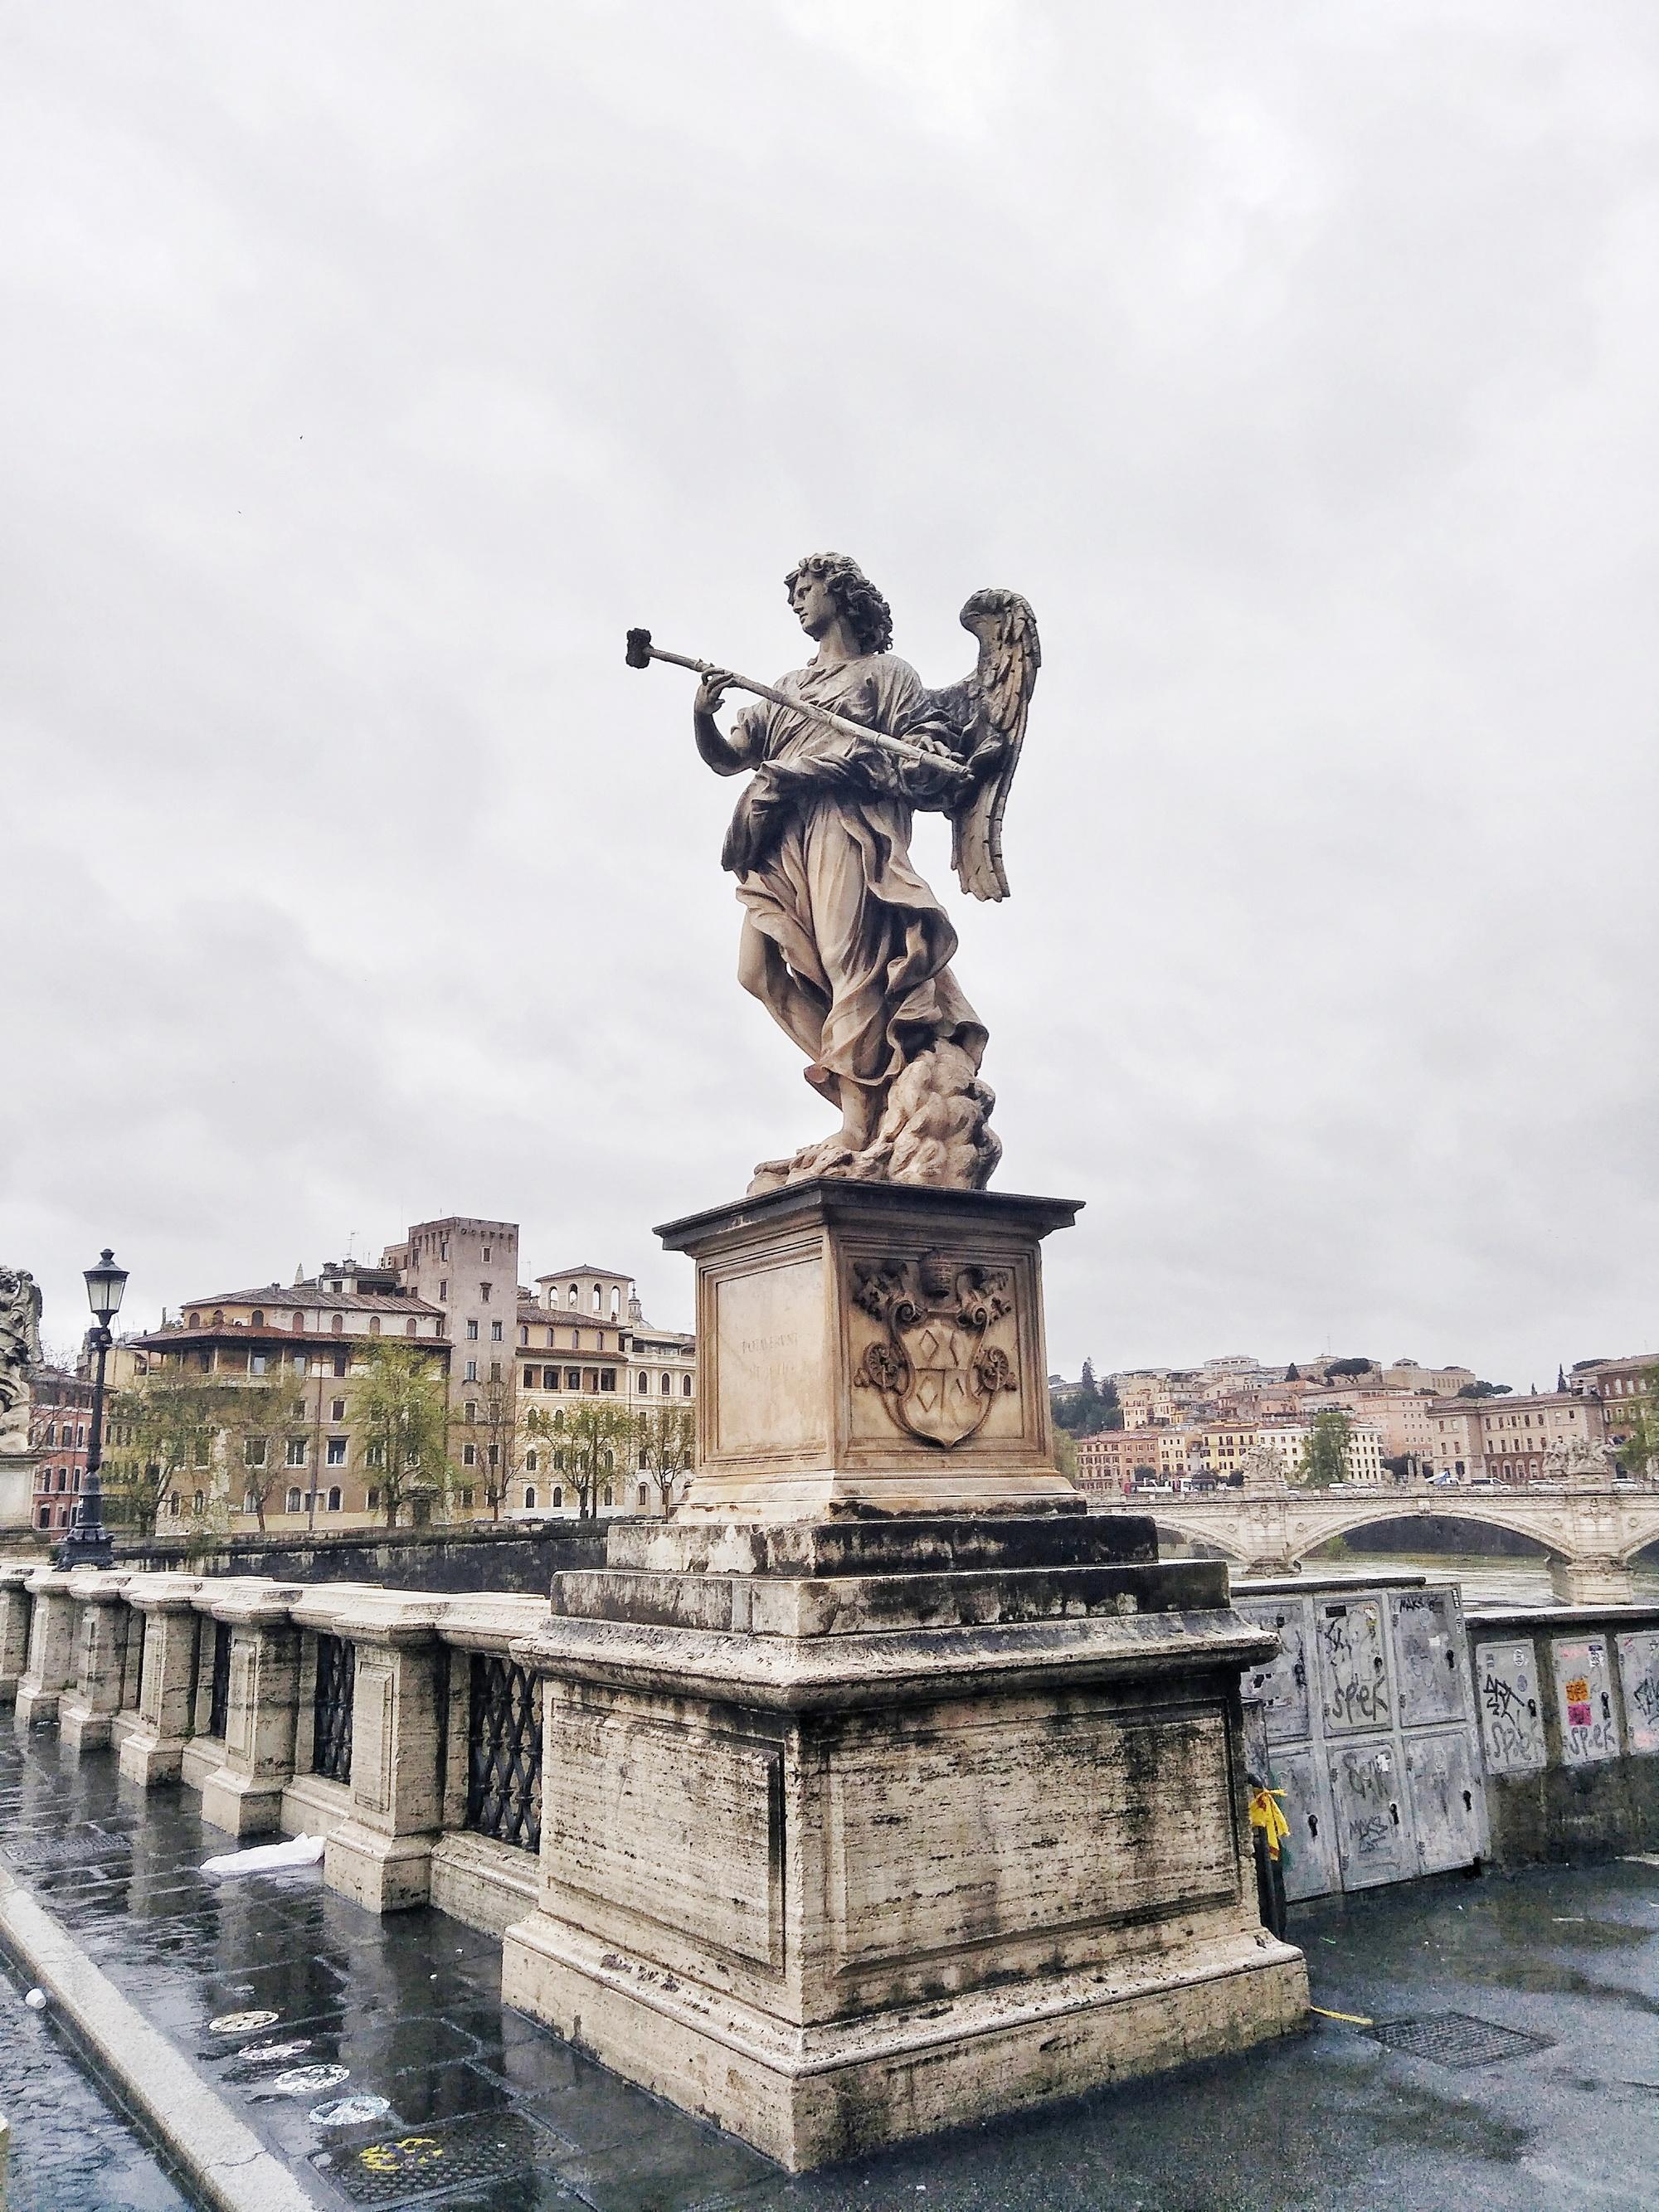 Рим: взгляд на Вечный город под другим углом Рим: взгляд на Вечный город под другим углом IMG 20180409 145548 01